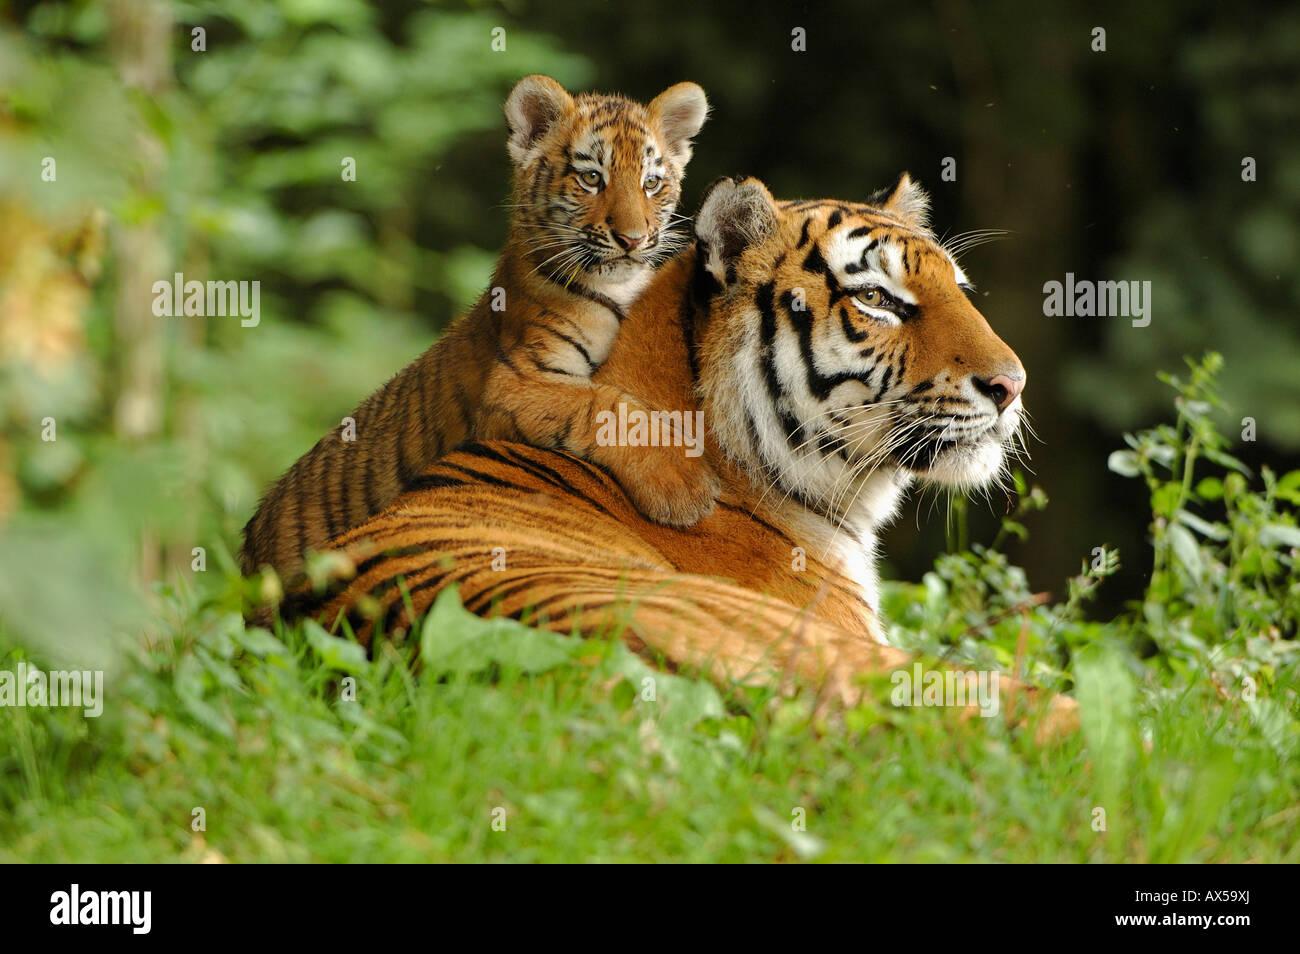 Sibirischer Tiger (Panthera Tigris Altaica) mit Jungtier Stockbild